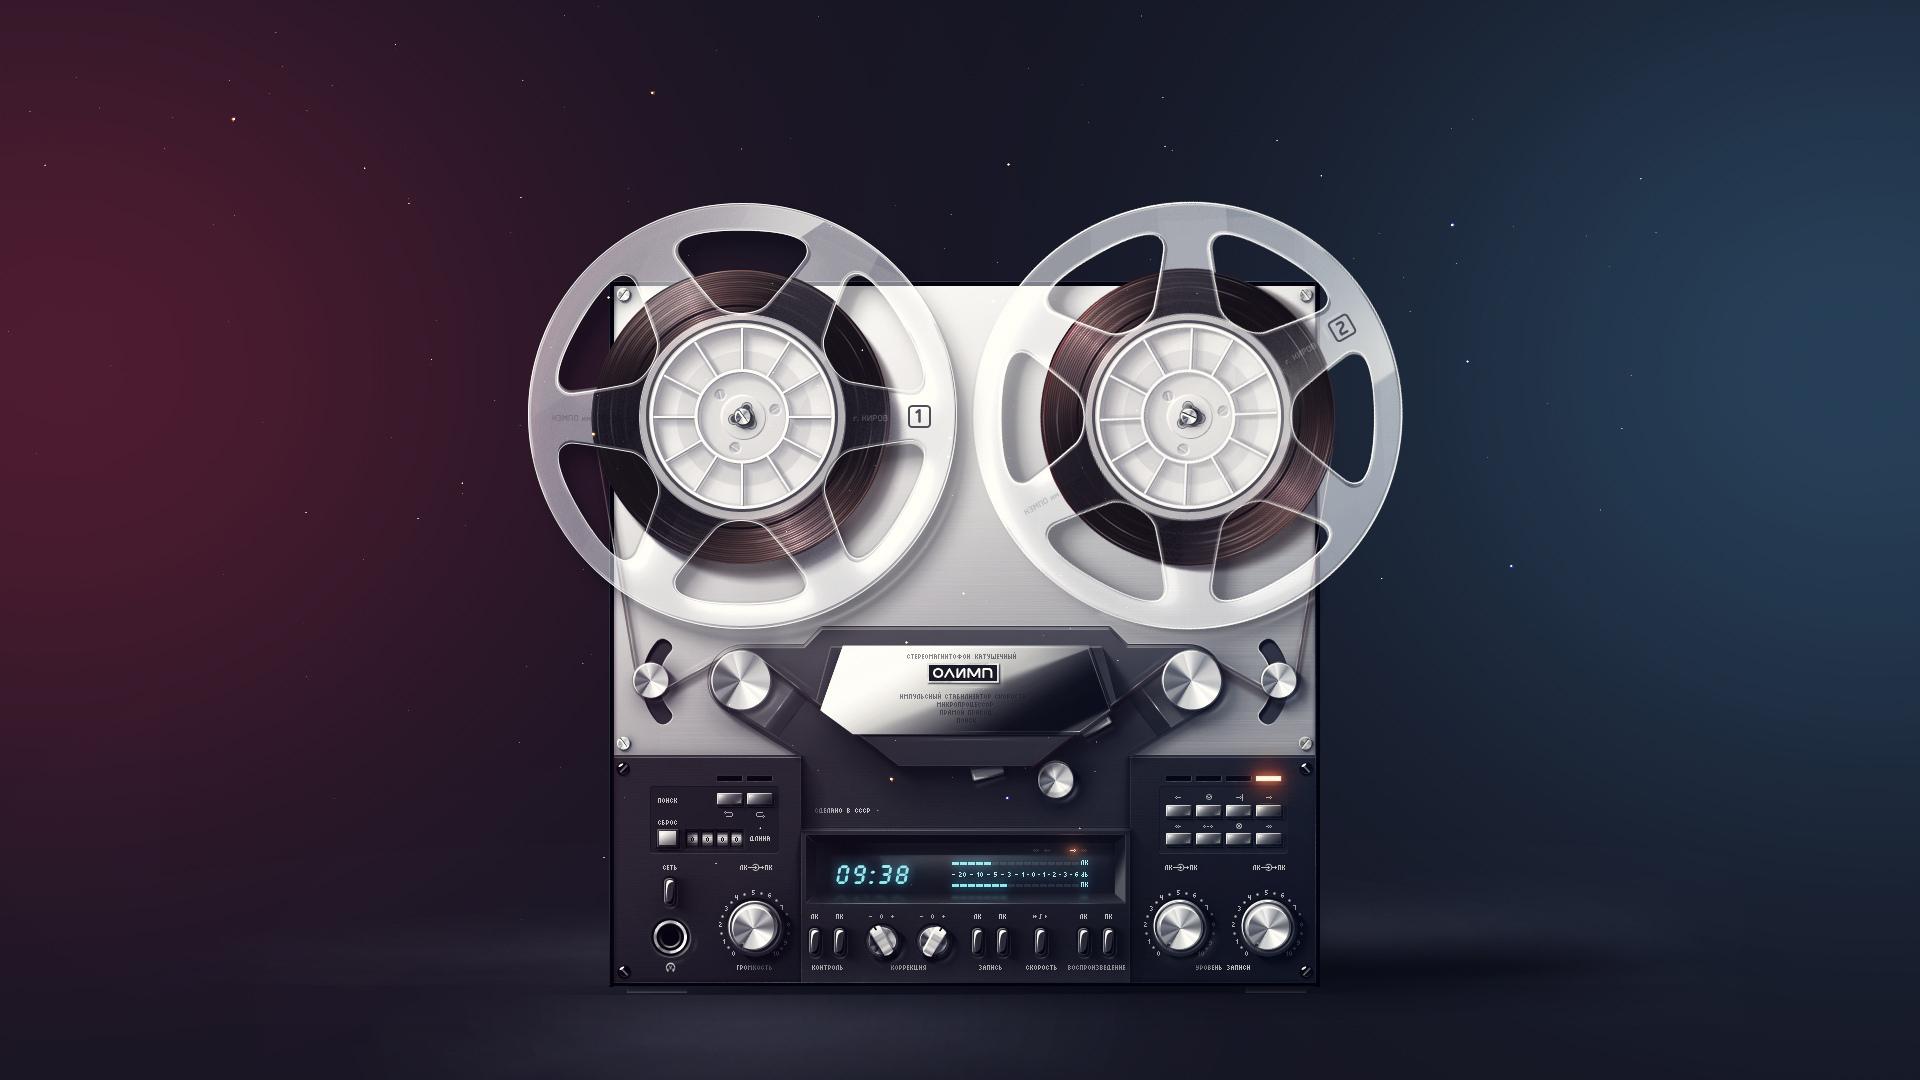 Картинка: Стереомагнитофон, Олимп, катушки, дисплей, фон, лента